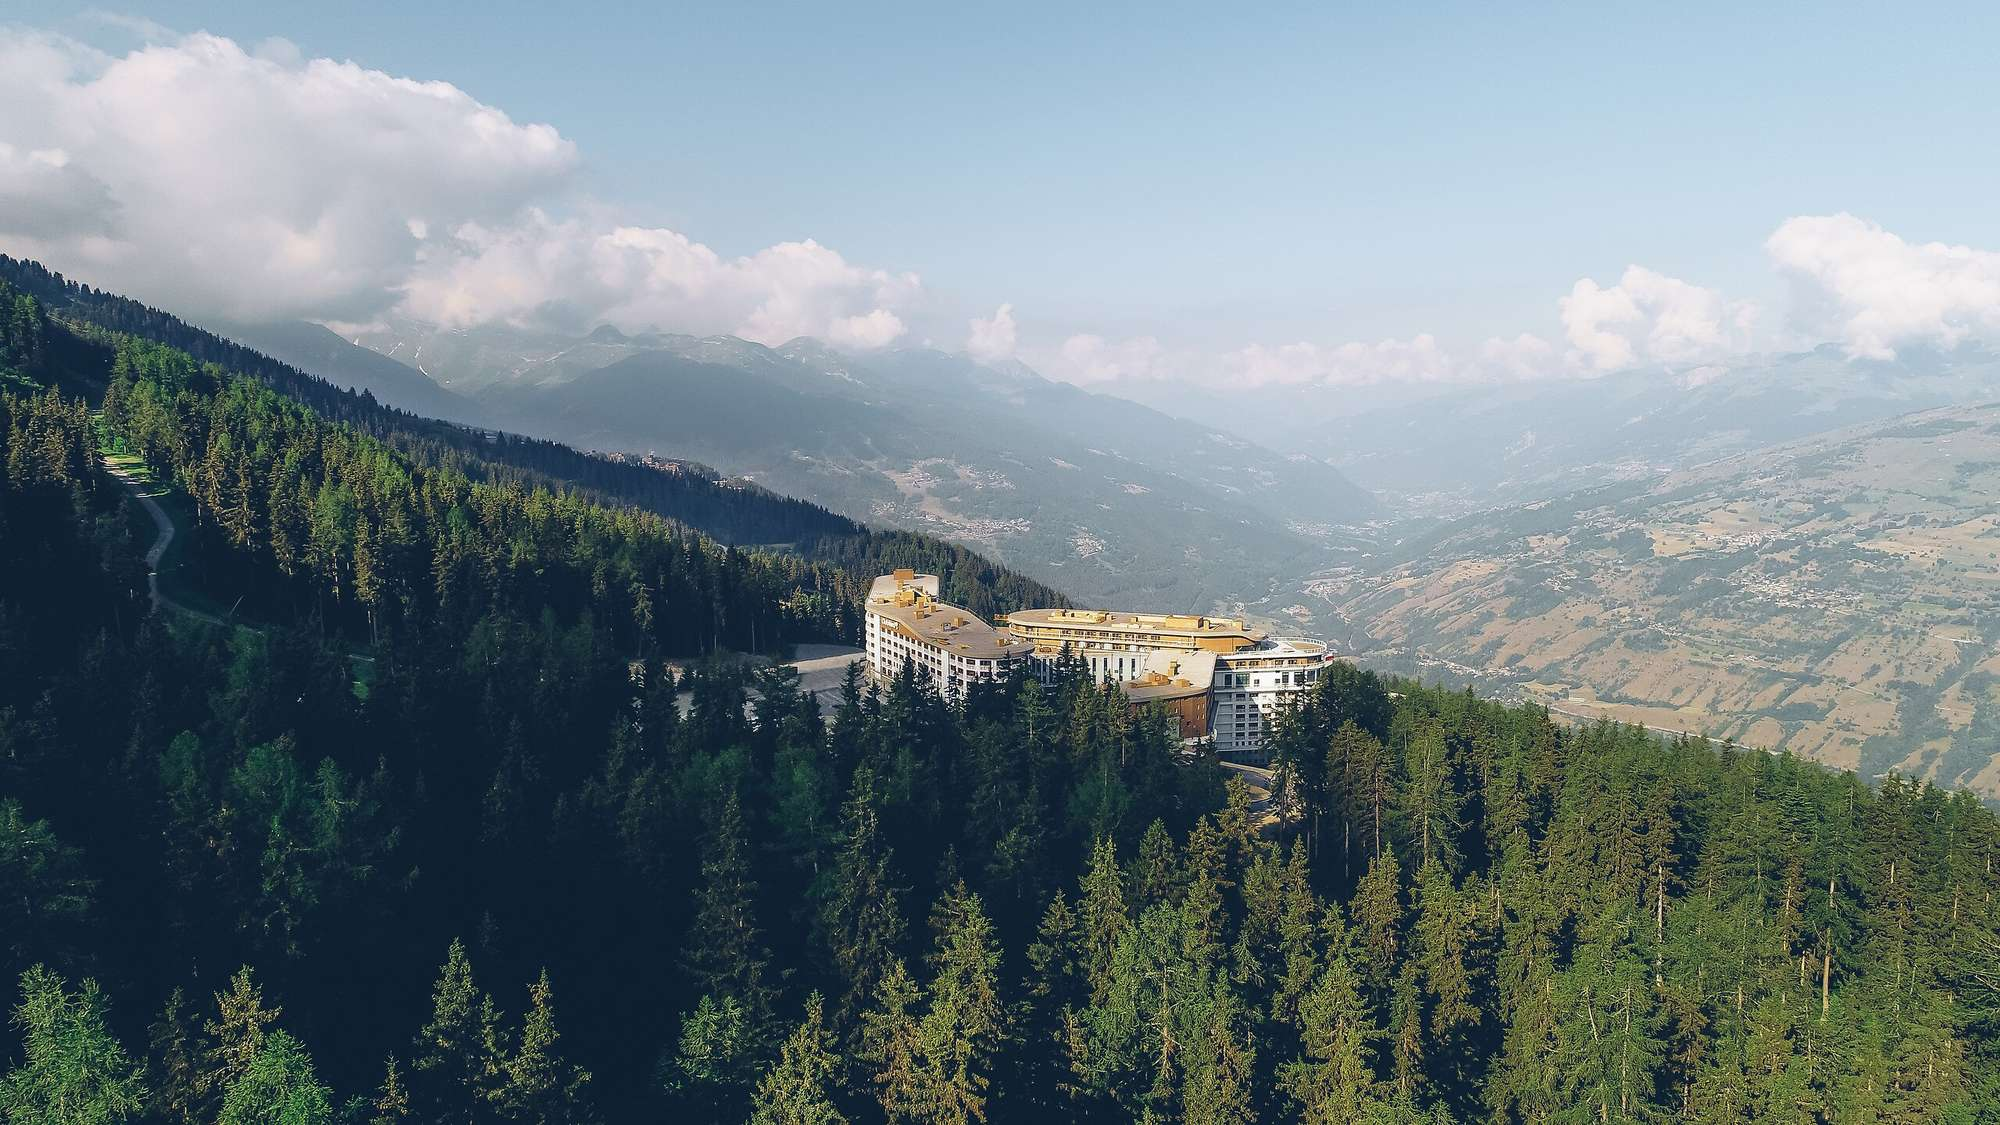 https___ns.clubmed.com_dream_RESORTS_3T___4T_Alpes_Les_Arcs_Panorama_172333-3cmxhvu1sf-swhr